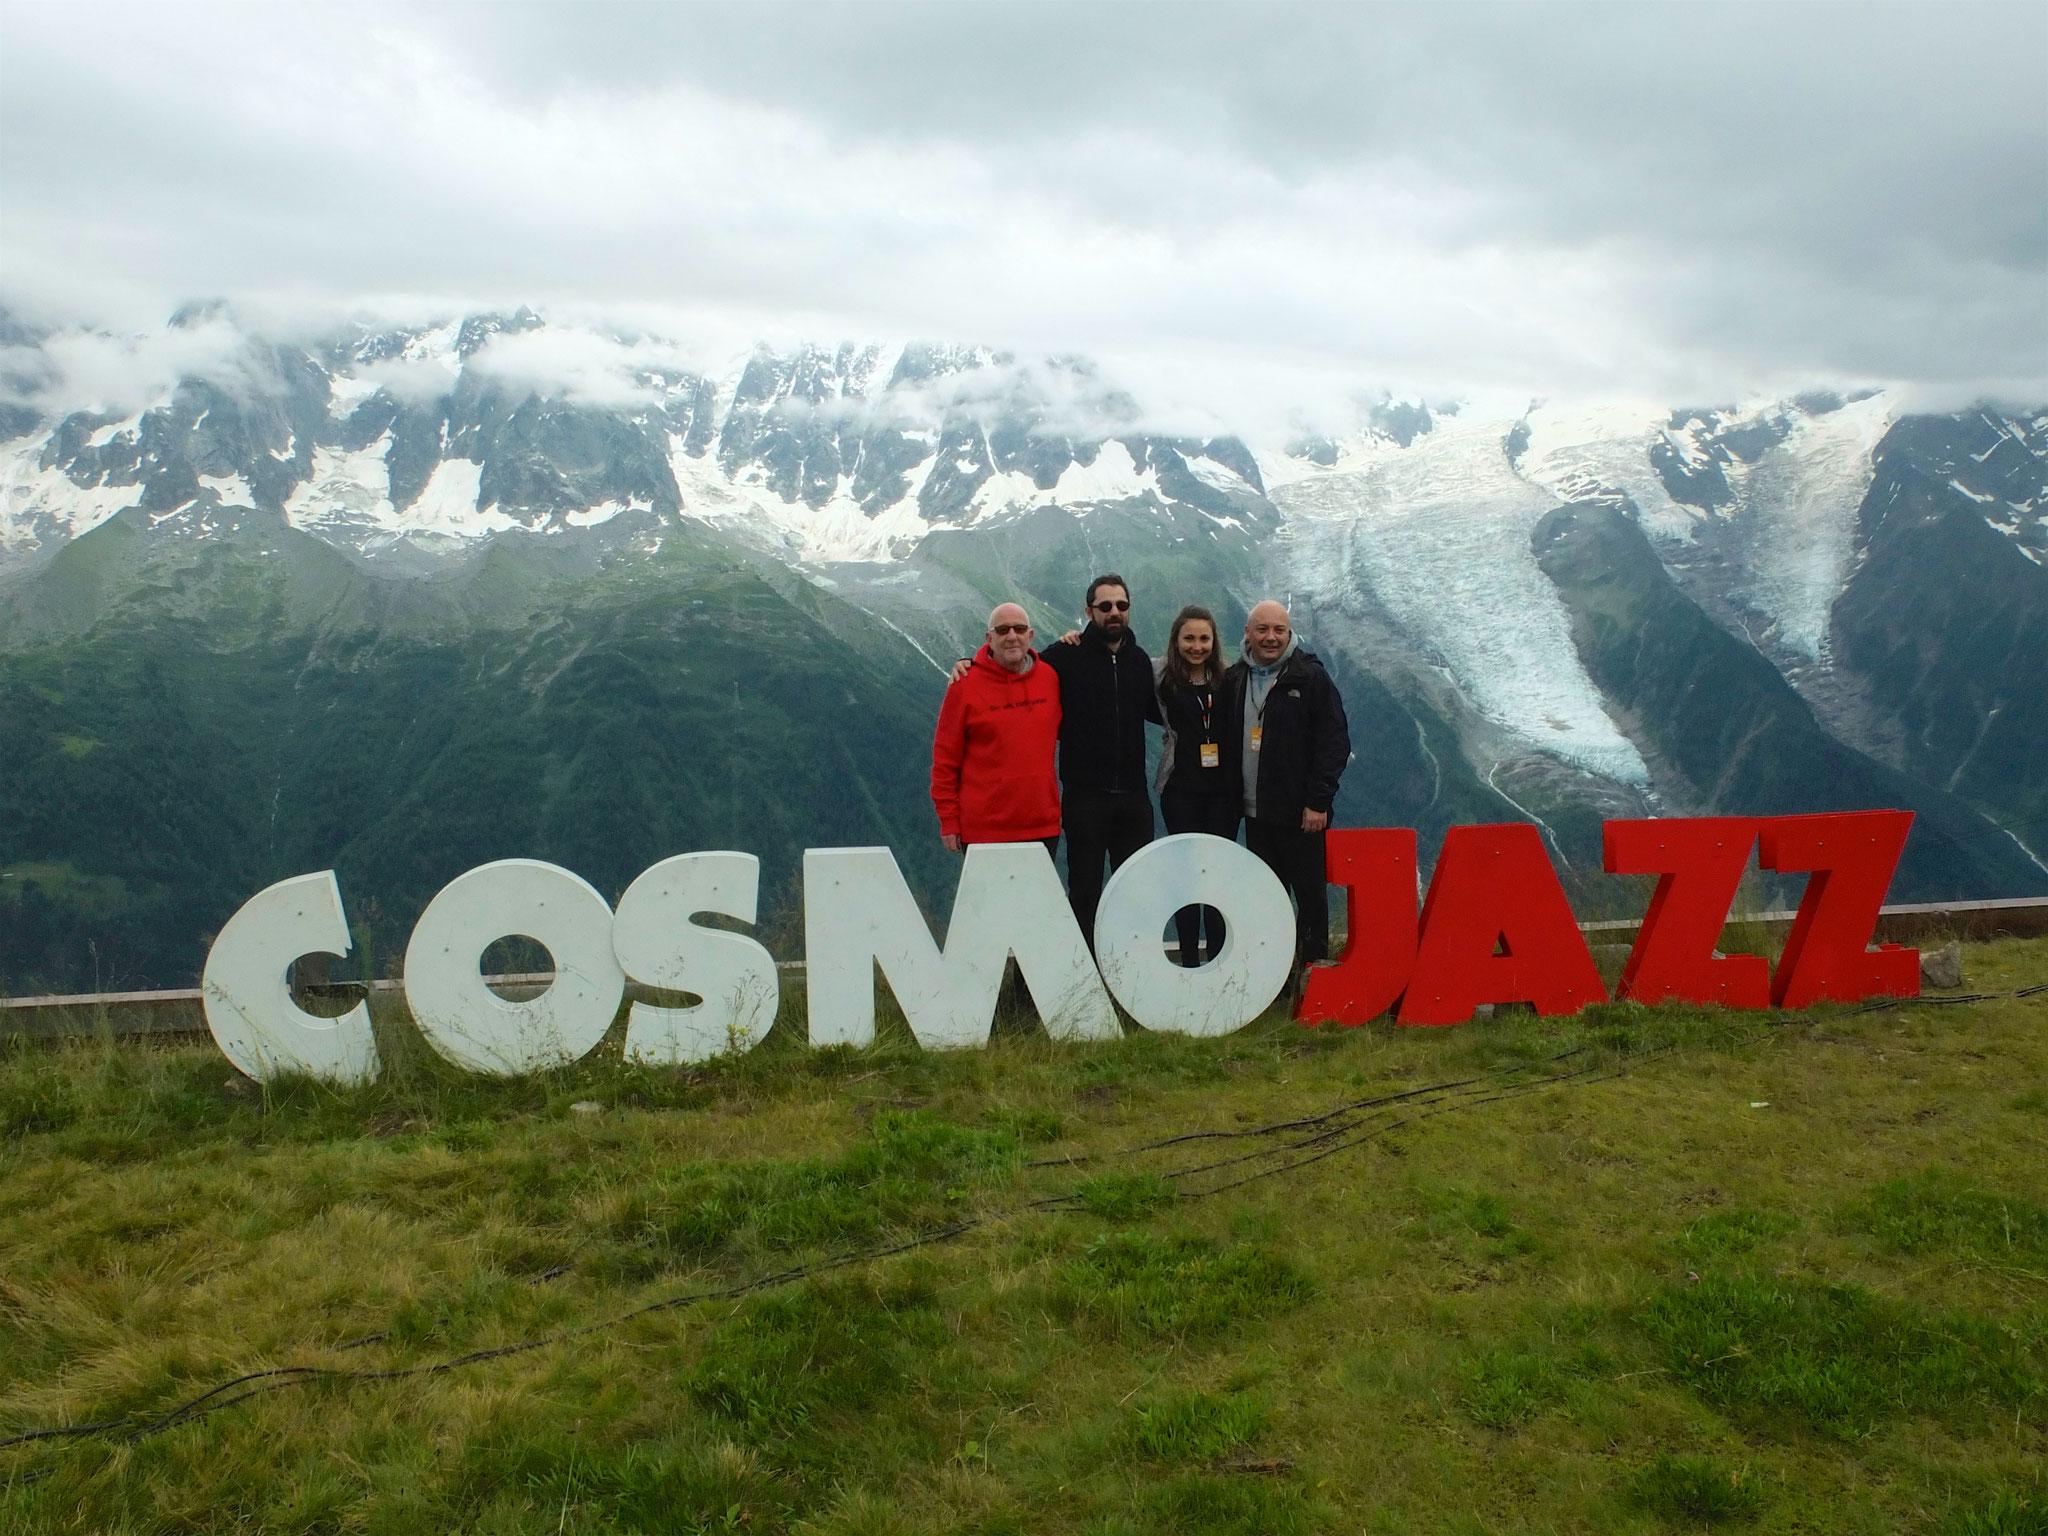 Mit Basel Rajoub, Lynn Adib und Andrea Piccioni, Chamonix Montblanc